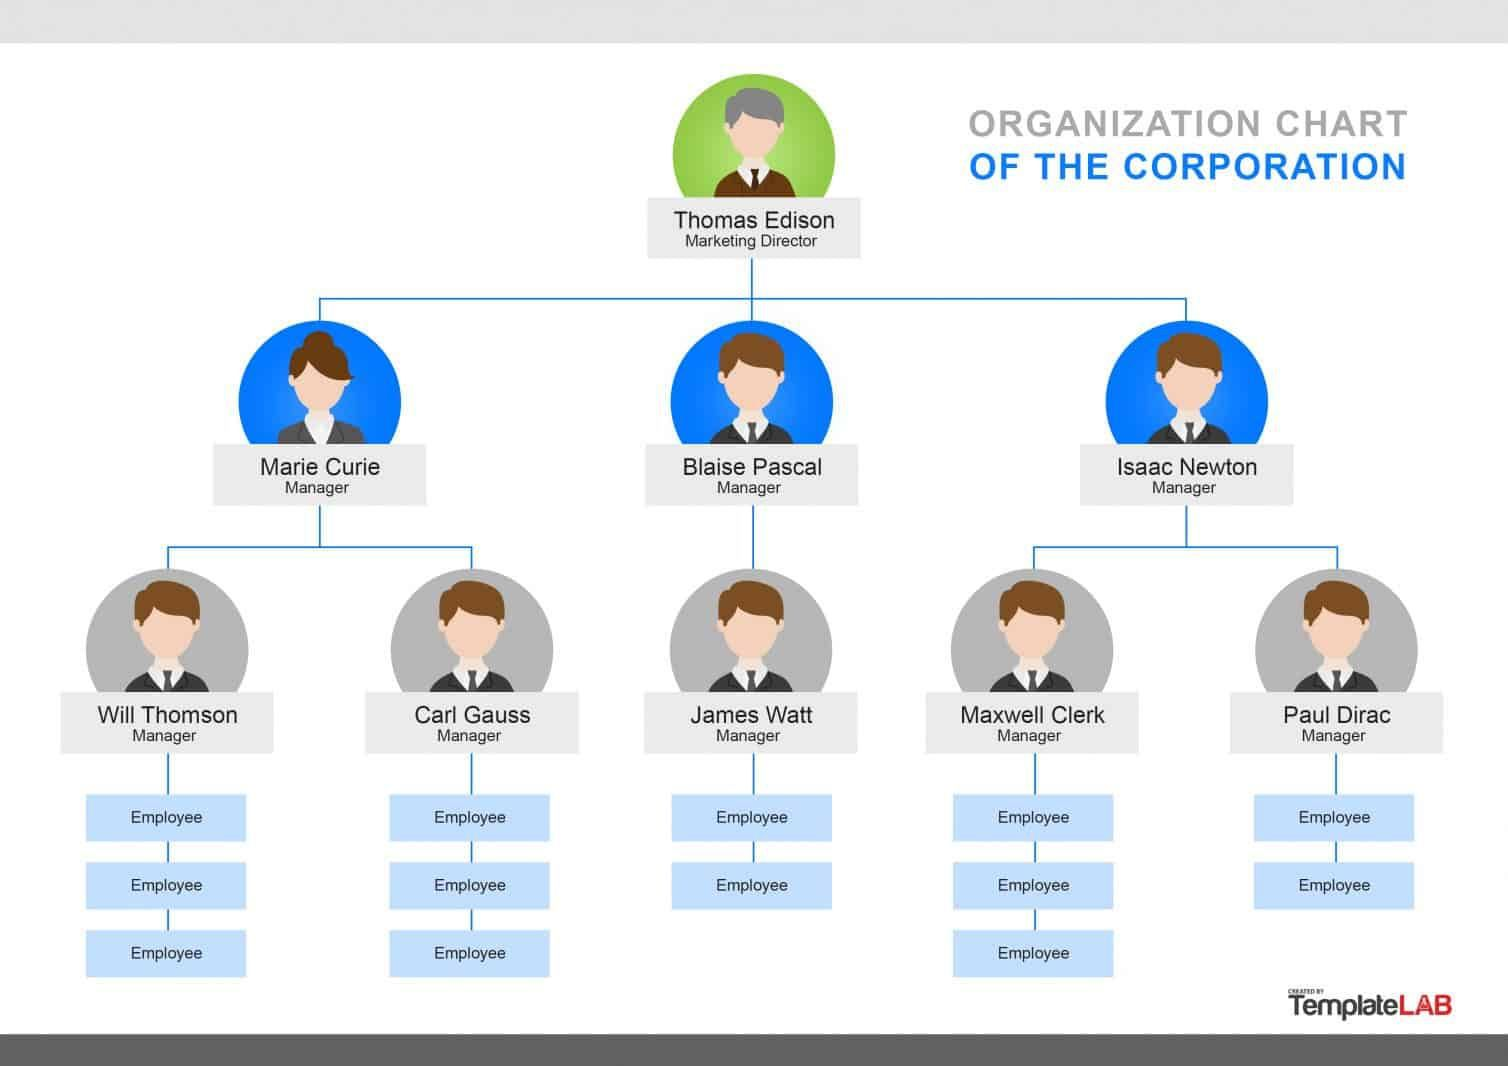 001 Fascinating Org Chart Template Powerpoint Photo  Free Organization Download Organizational 2010Full